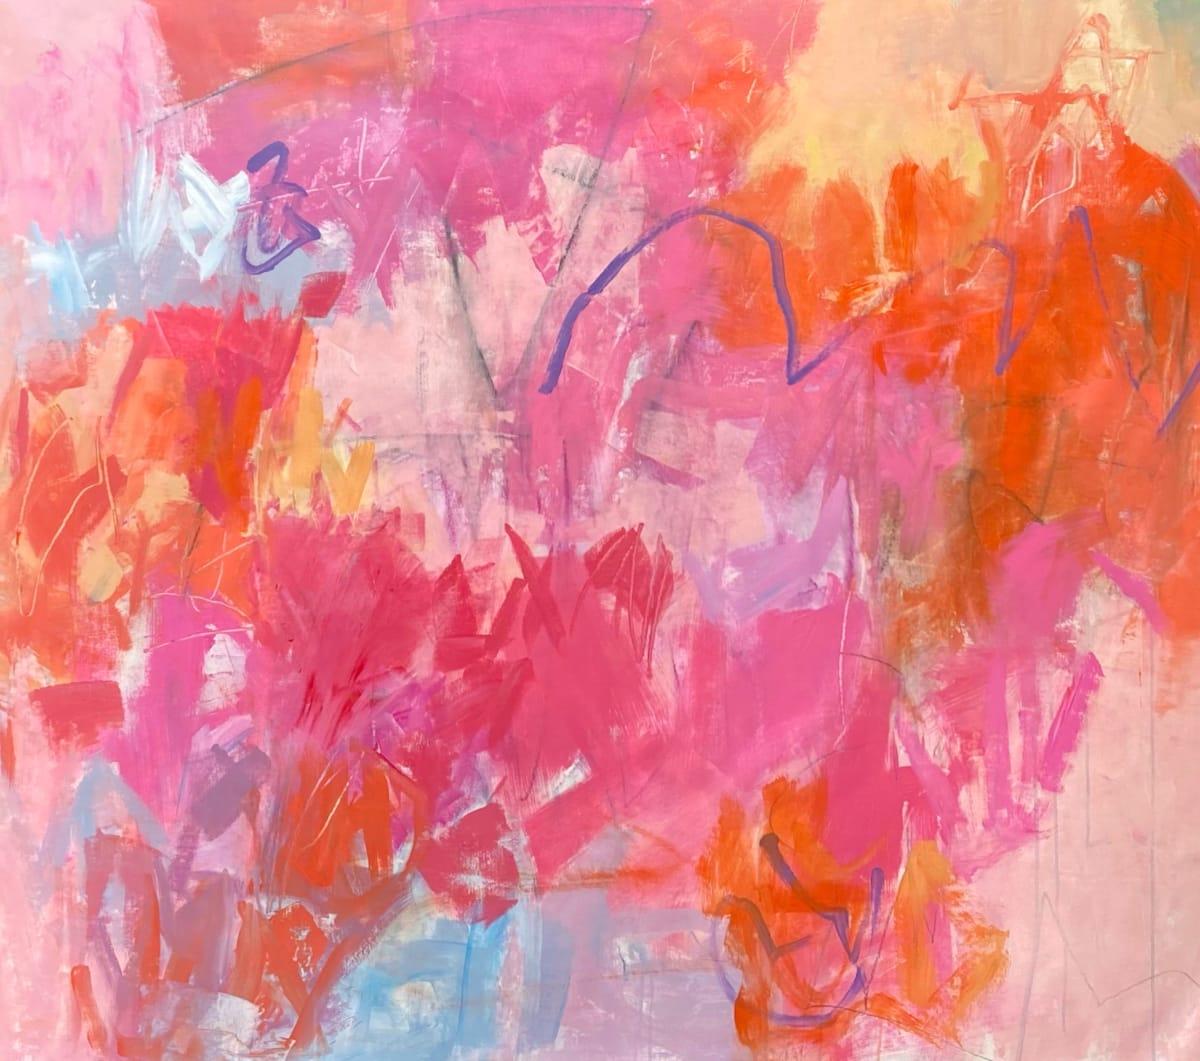 Jubilant by Michelle Marra